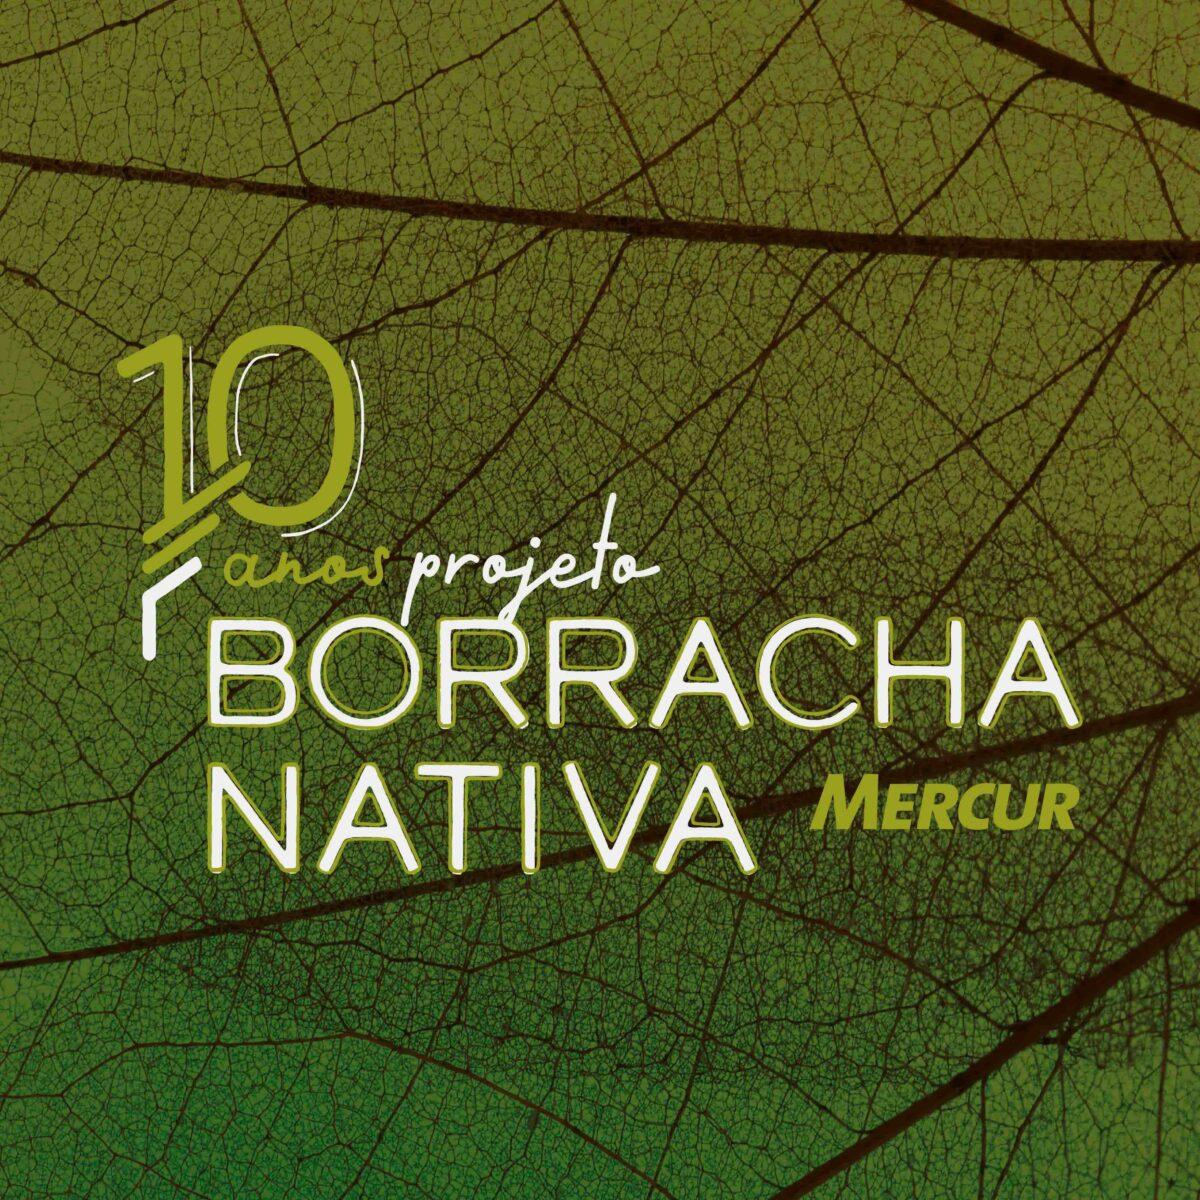 Borracha Nativa